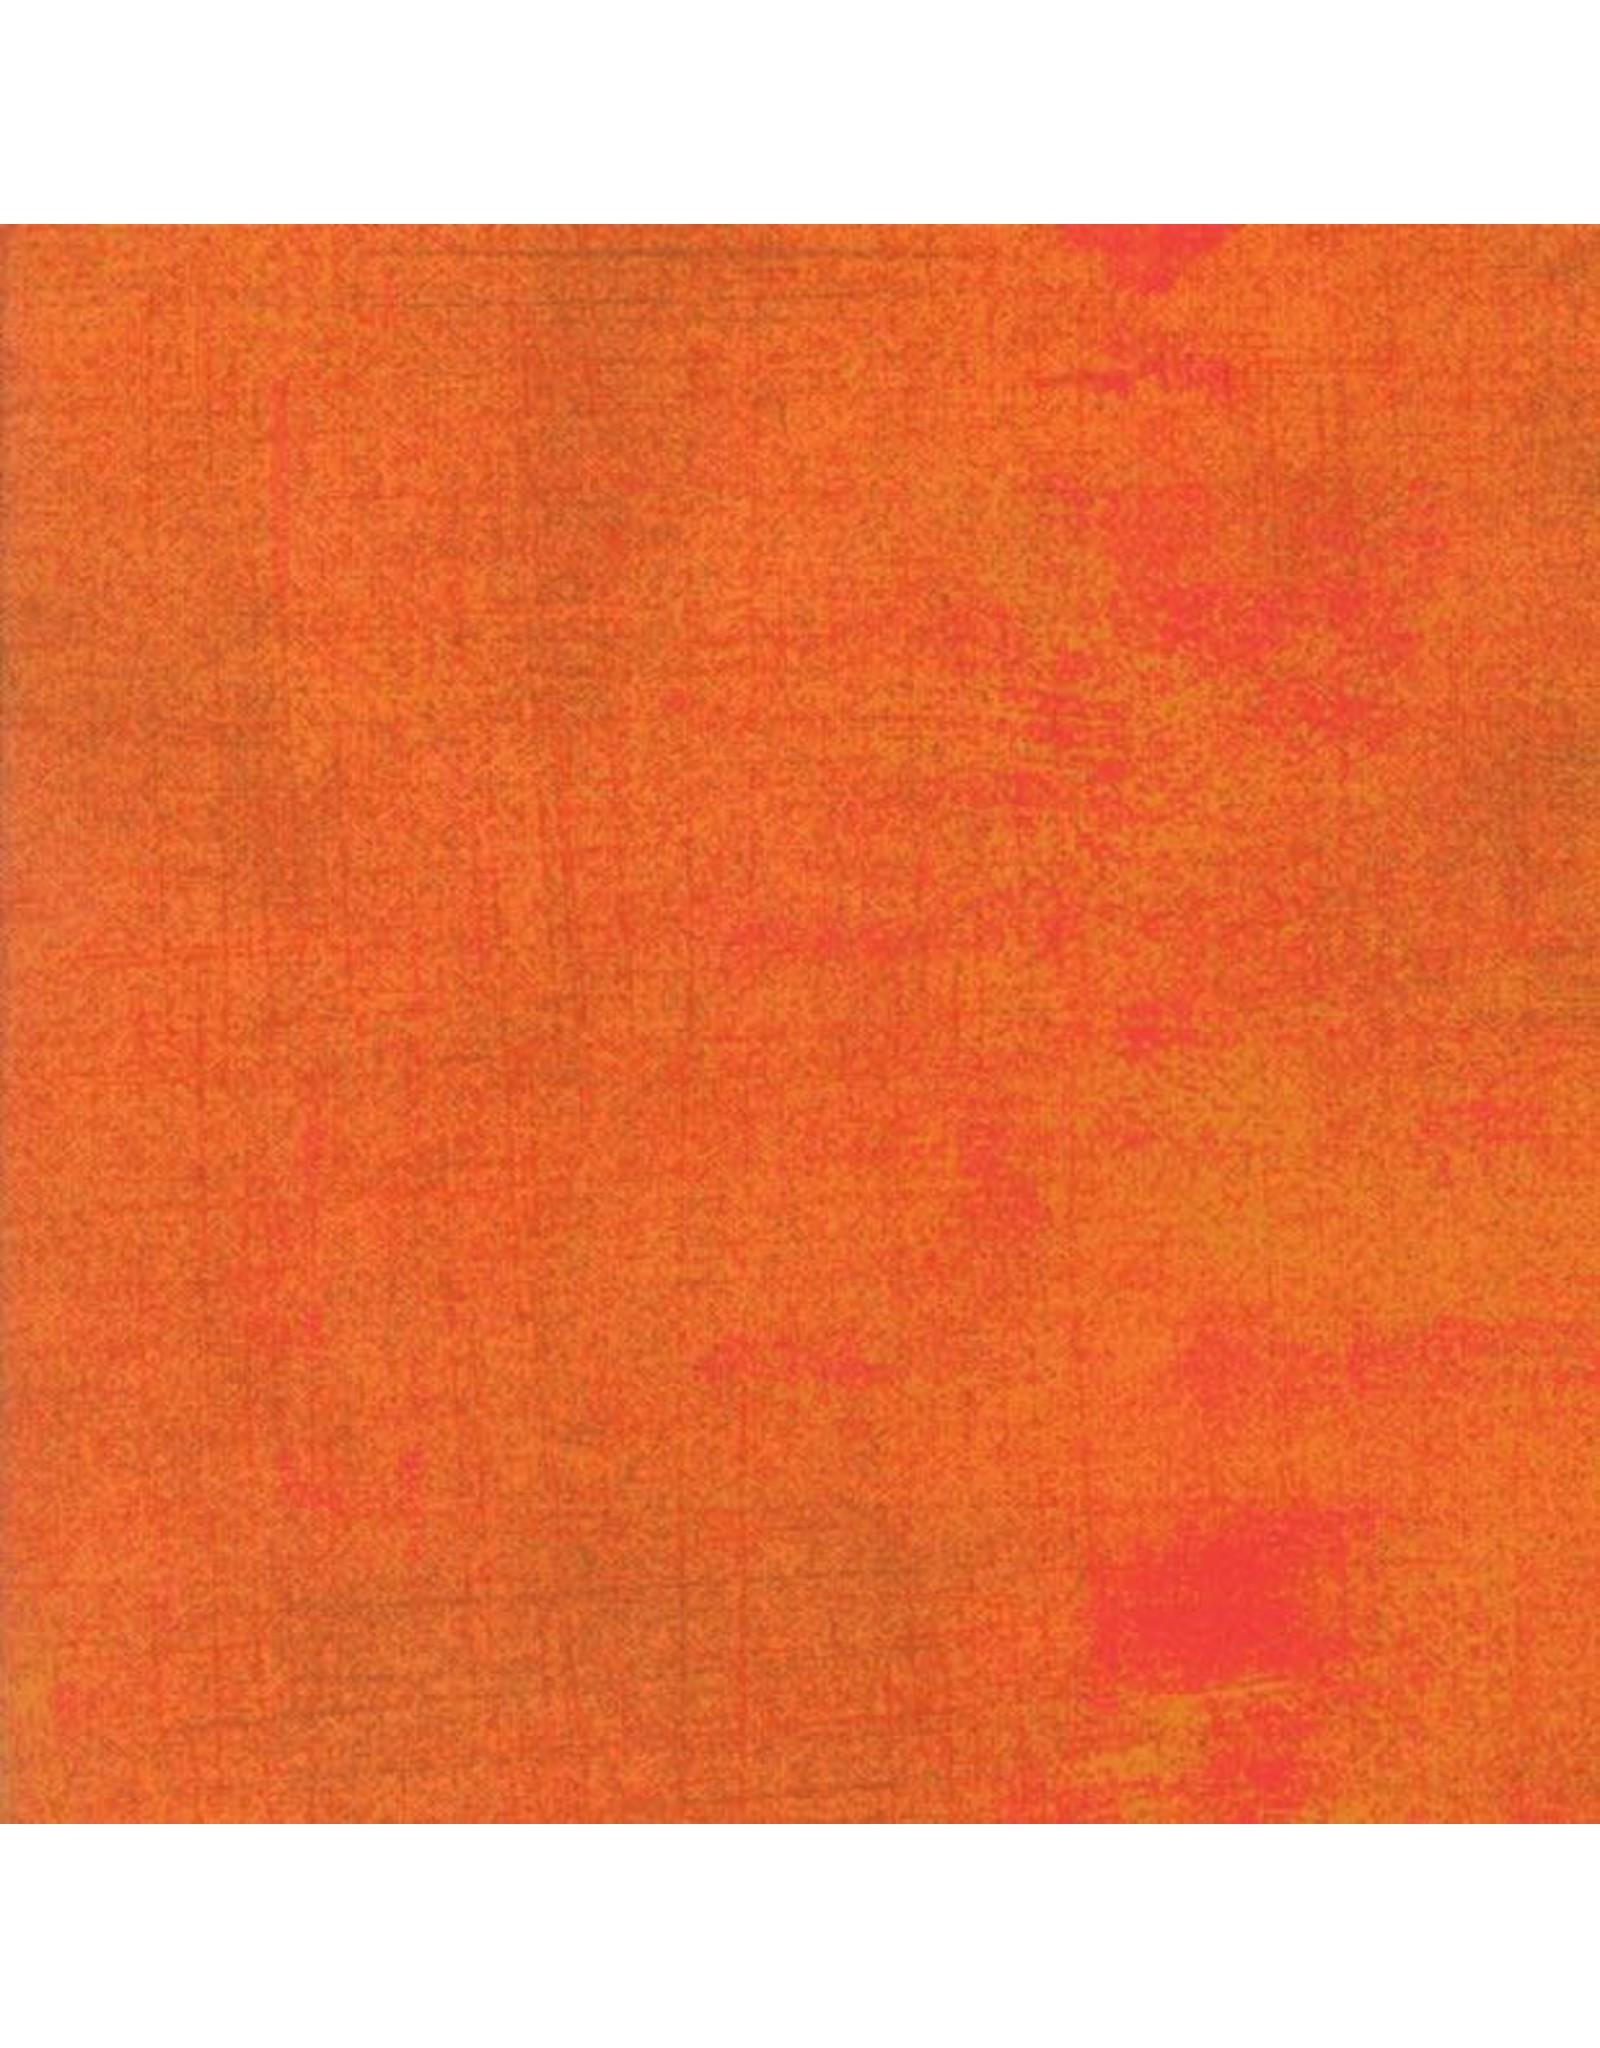 Moda Grunge in Russet Orange, Fabric Half-Yards